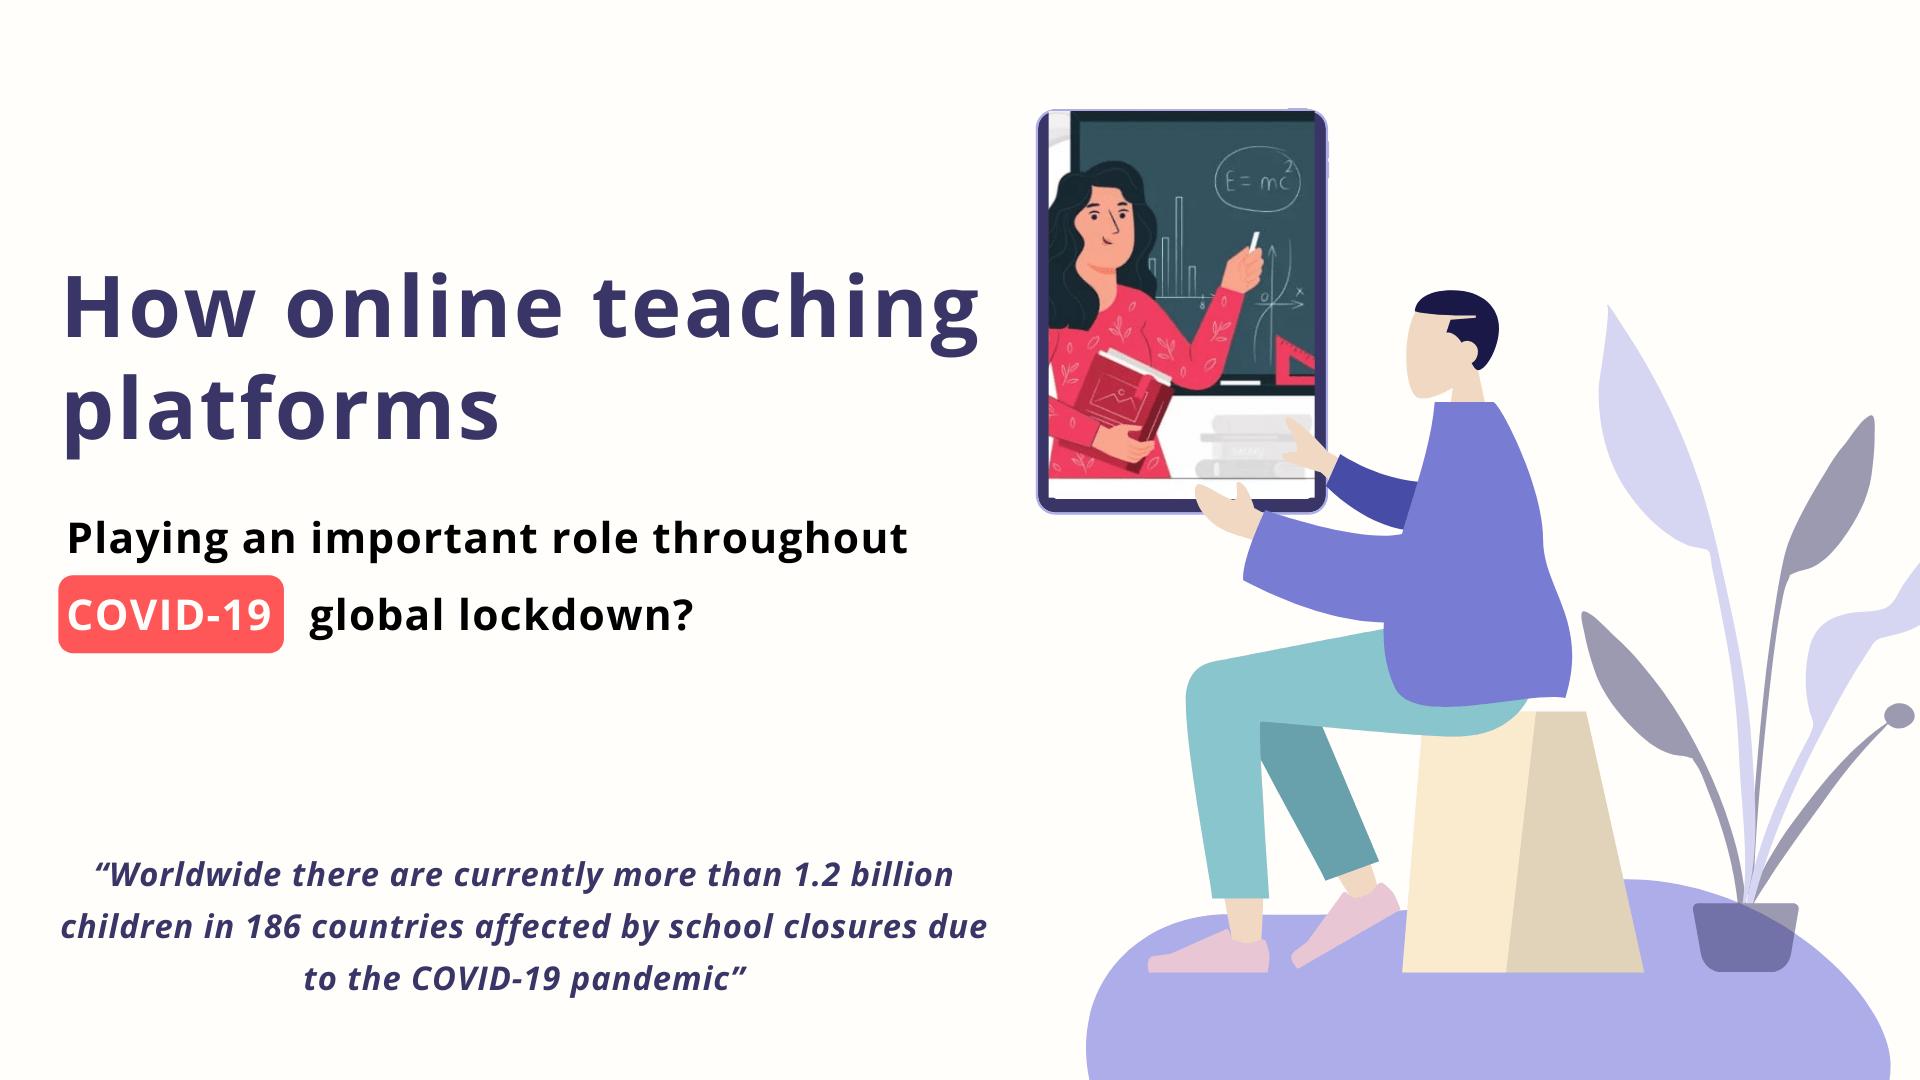 How online teaching platforms